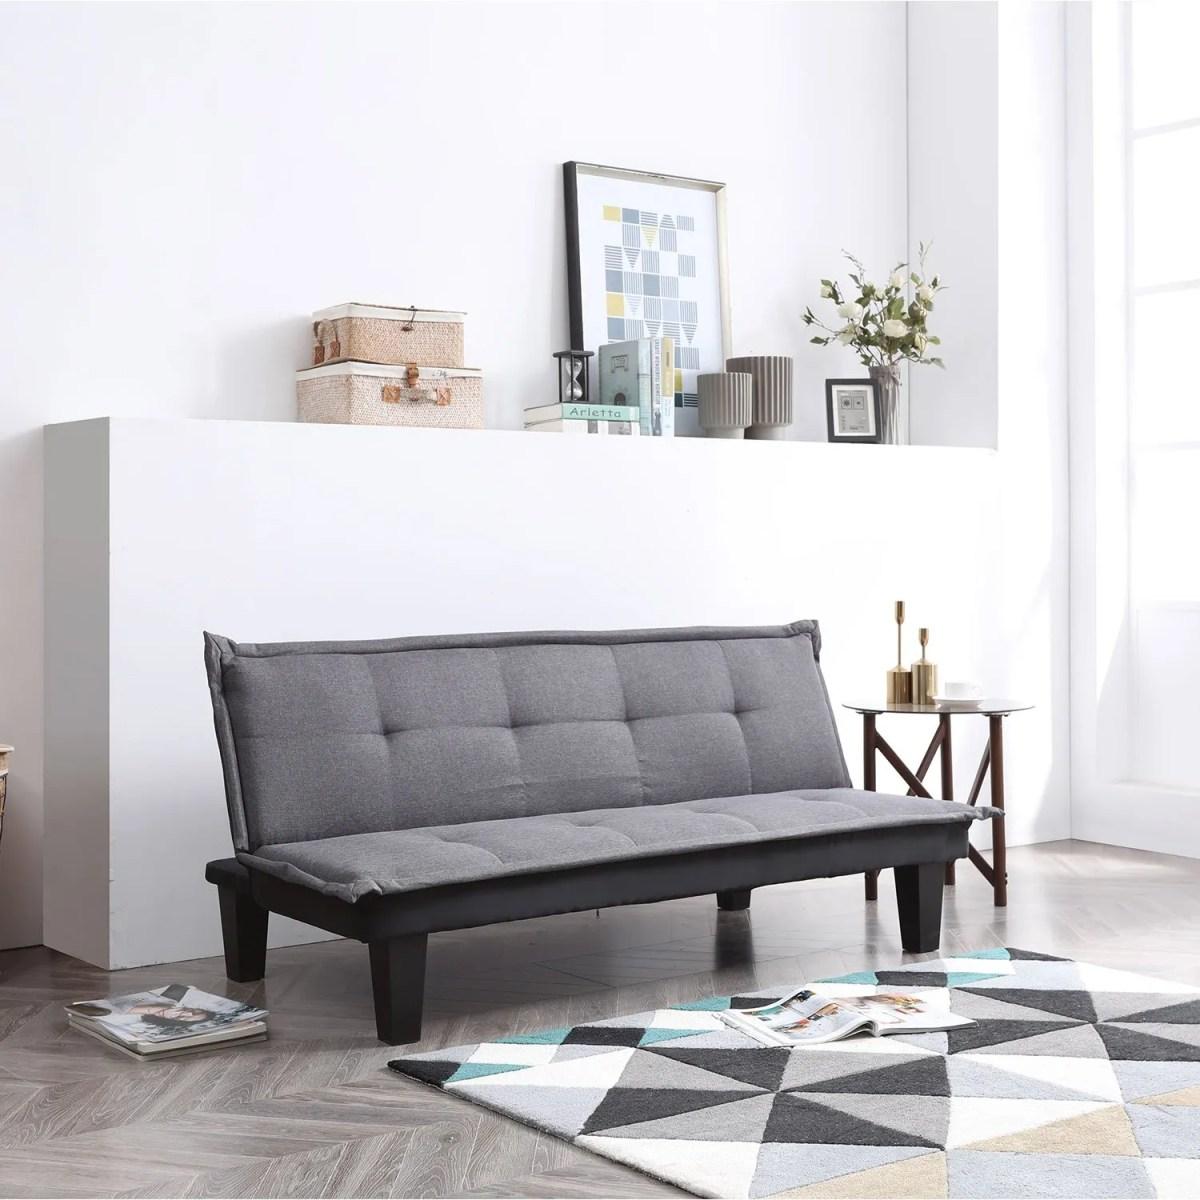 sofacama reclinable individual bossa independencia 3